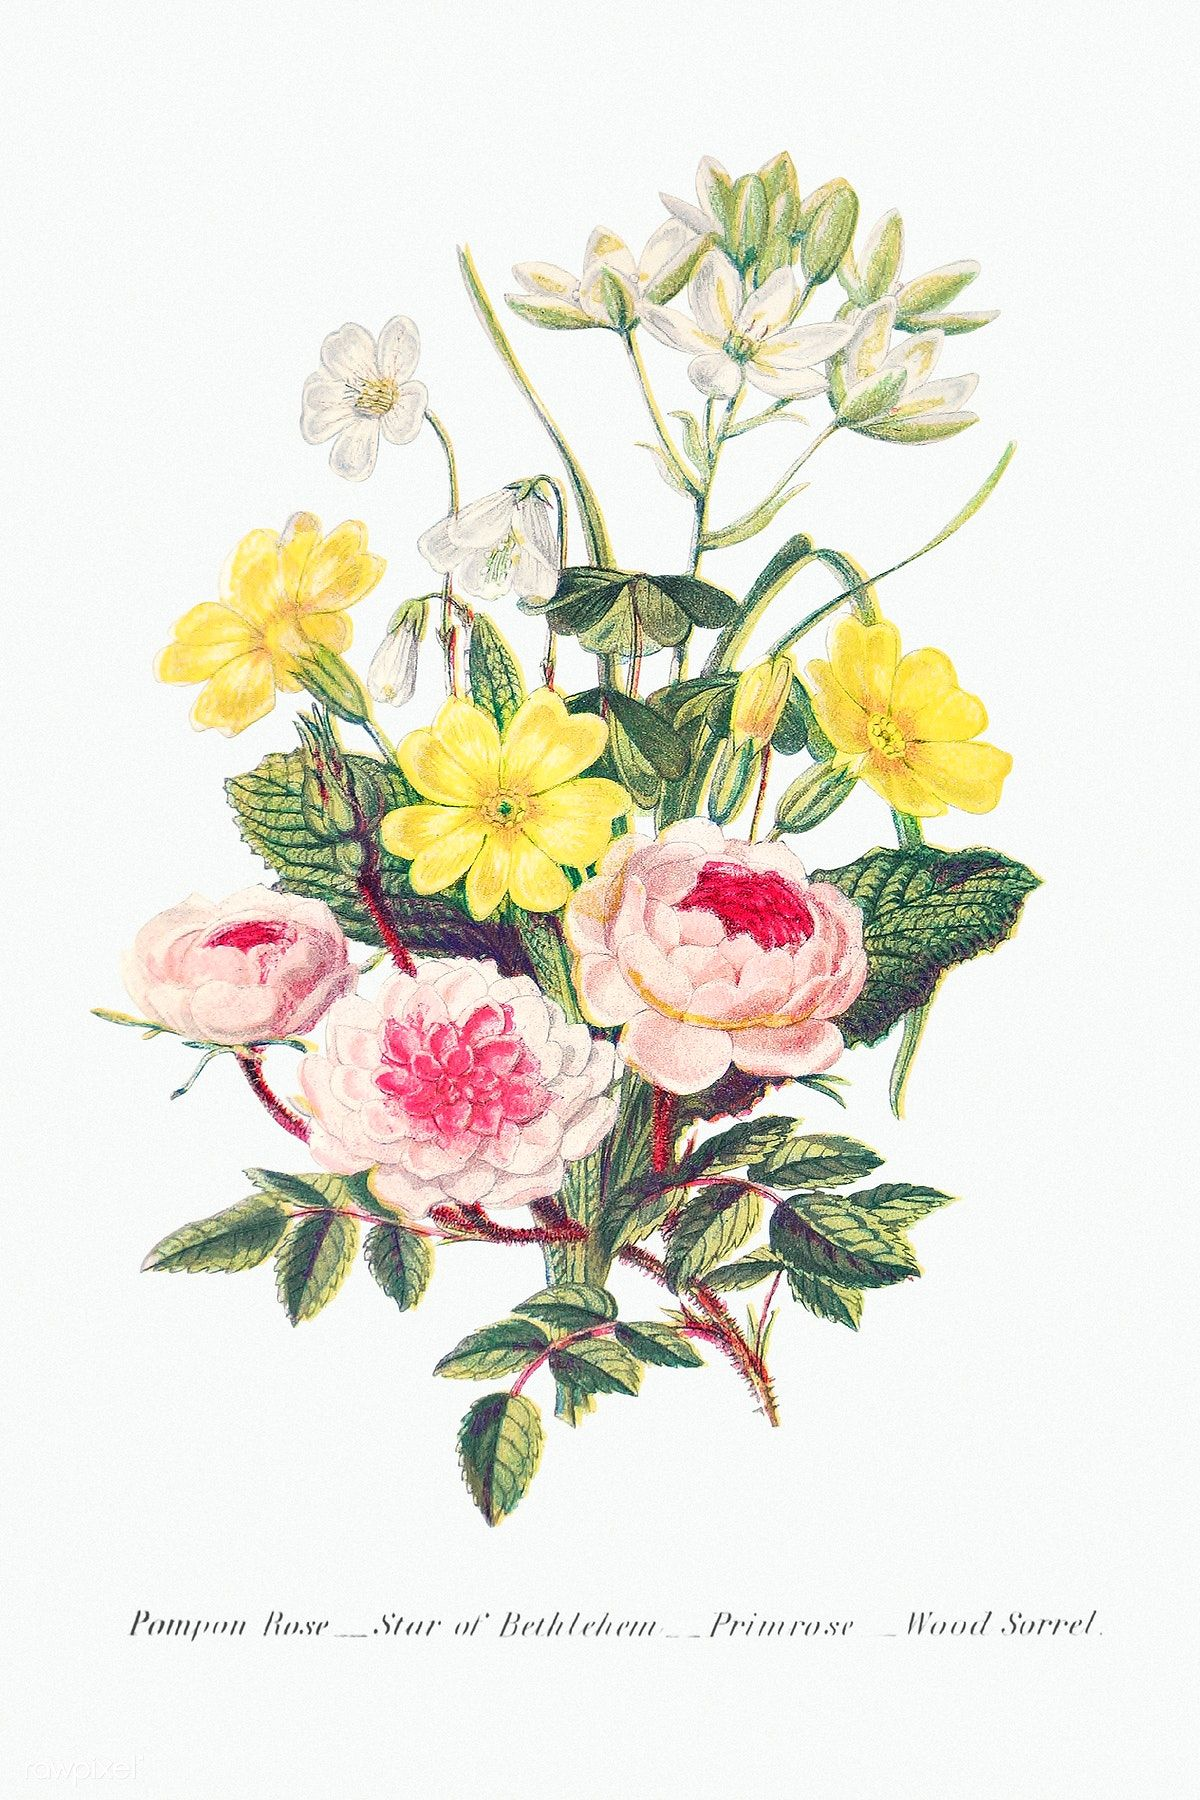 Download Premium Illustration Of Vintage Flower Bouquet Mockup 2099992 In 2020 Illustration Flowers Bouquet Vintage Flowers